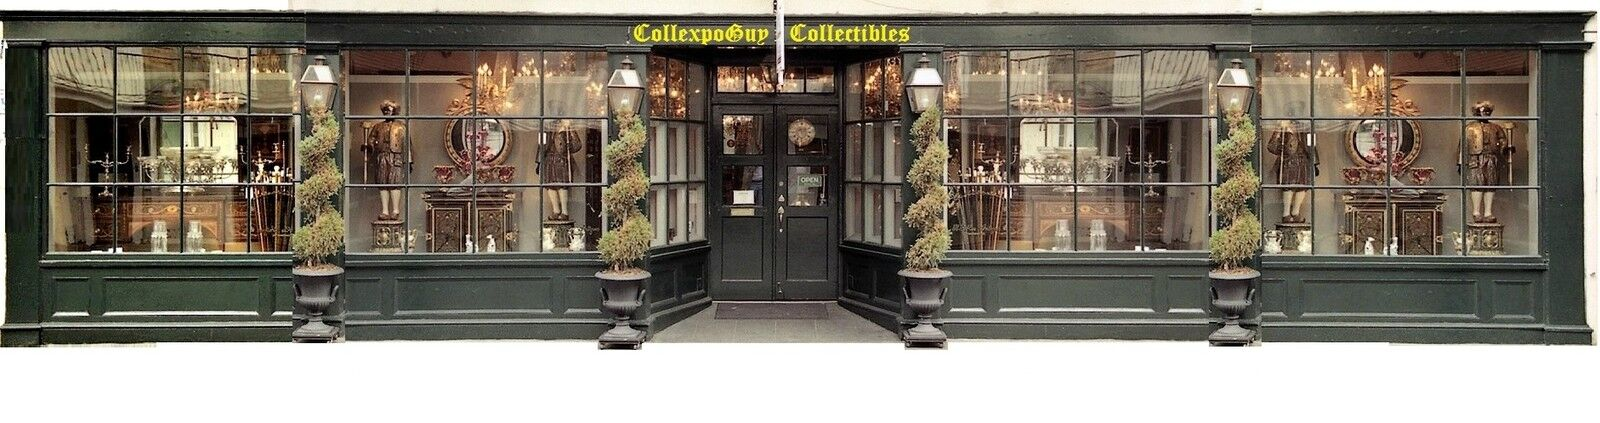 collexpoguy2012